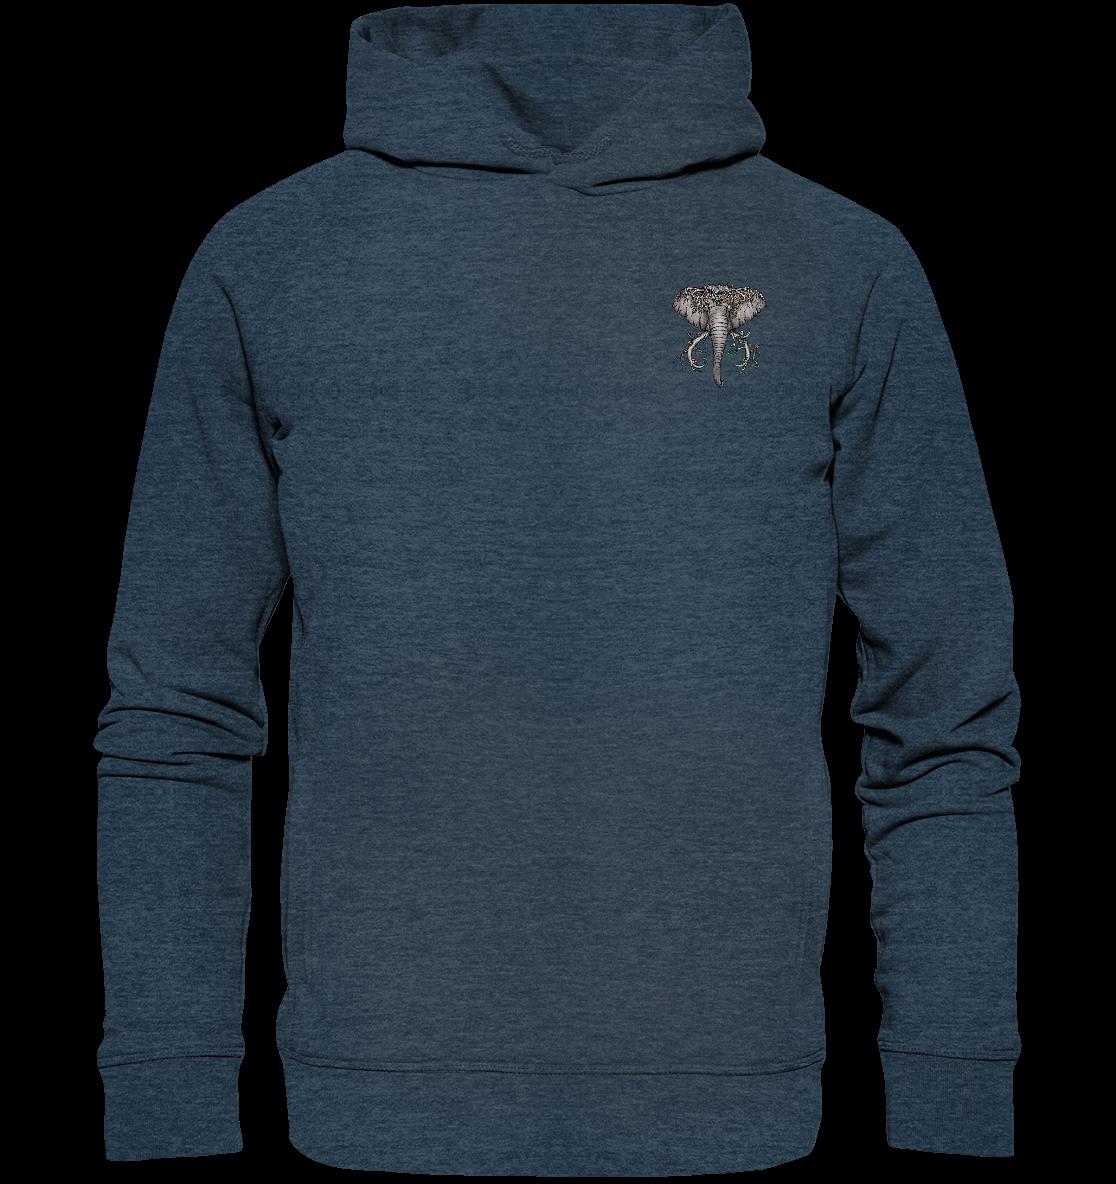 front-organic-fashion-hoodie-102940-1116x-1.png